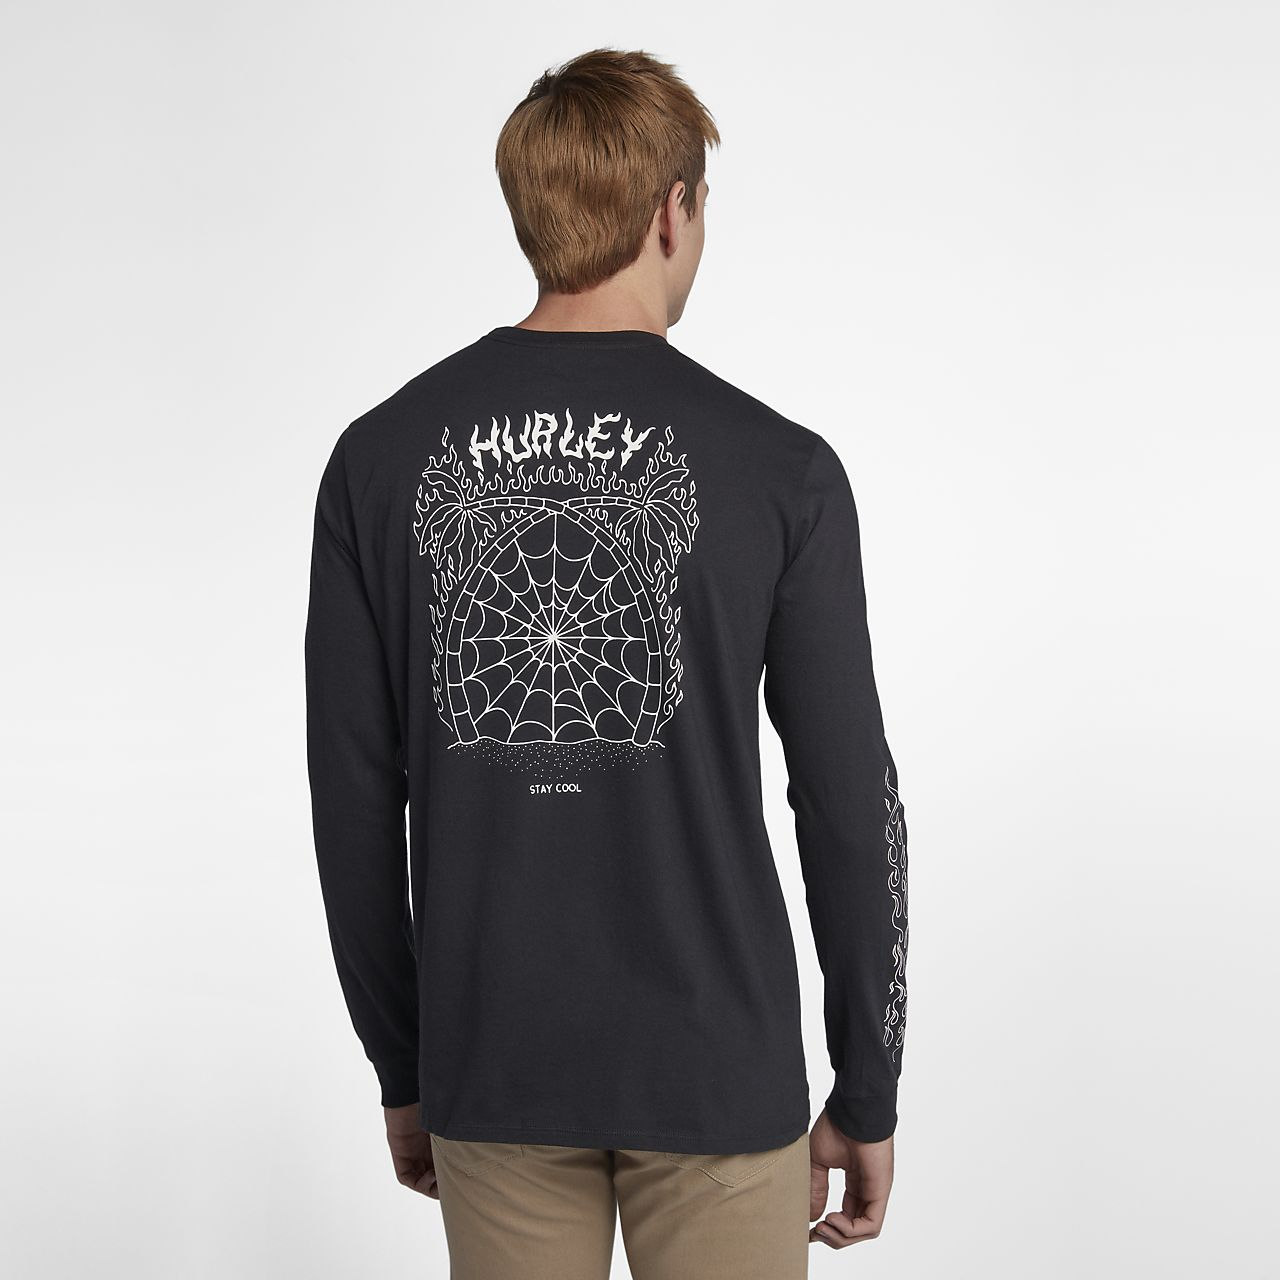 Hurley Stay Cool Men's Long Sleeve T-Shirt. Nike.com